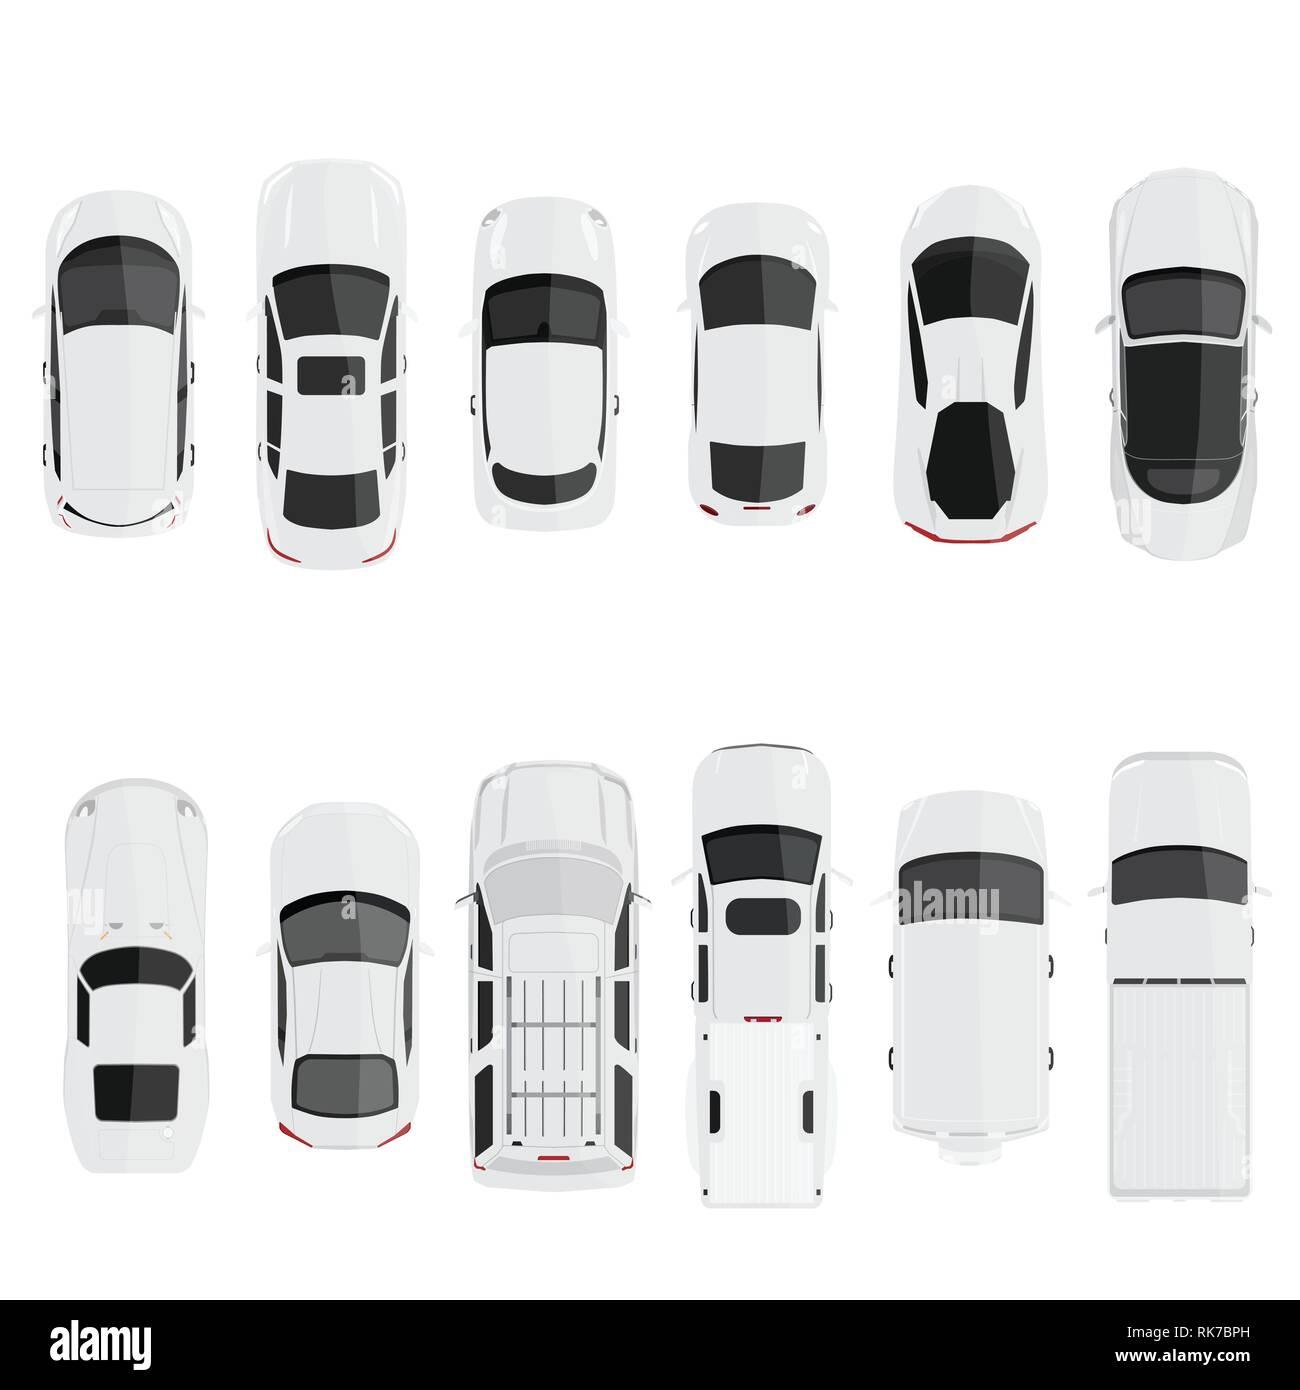 Cars Top View Vector Flat City Vehicle Transport Set Automobile Car